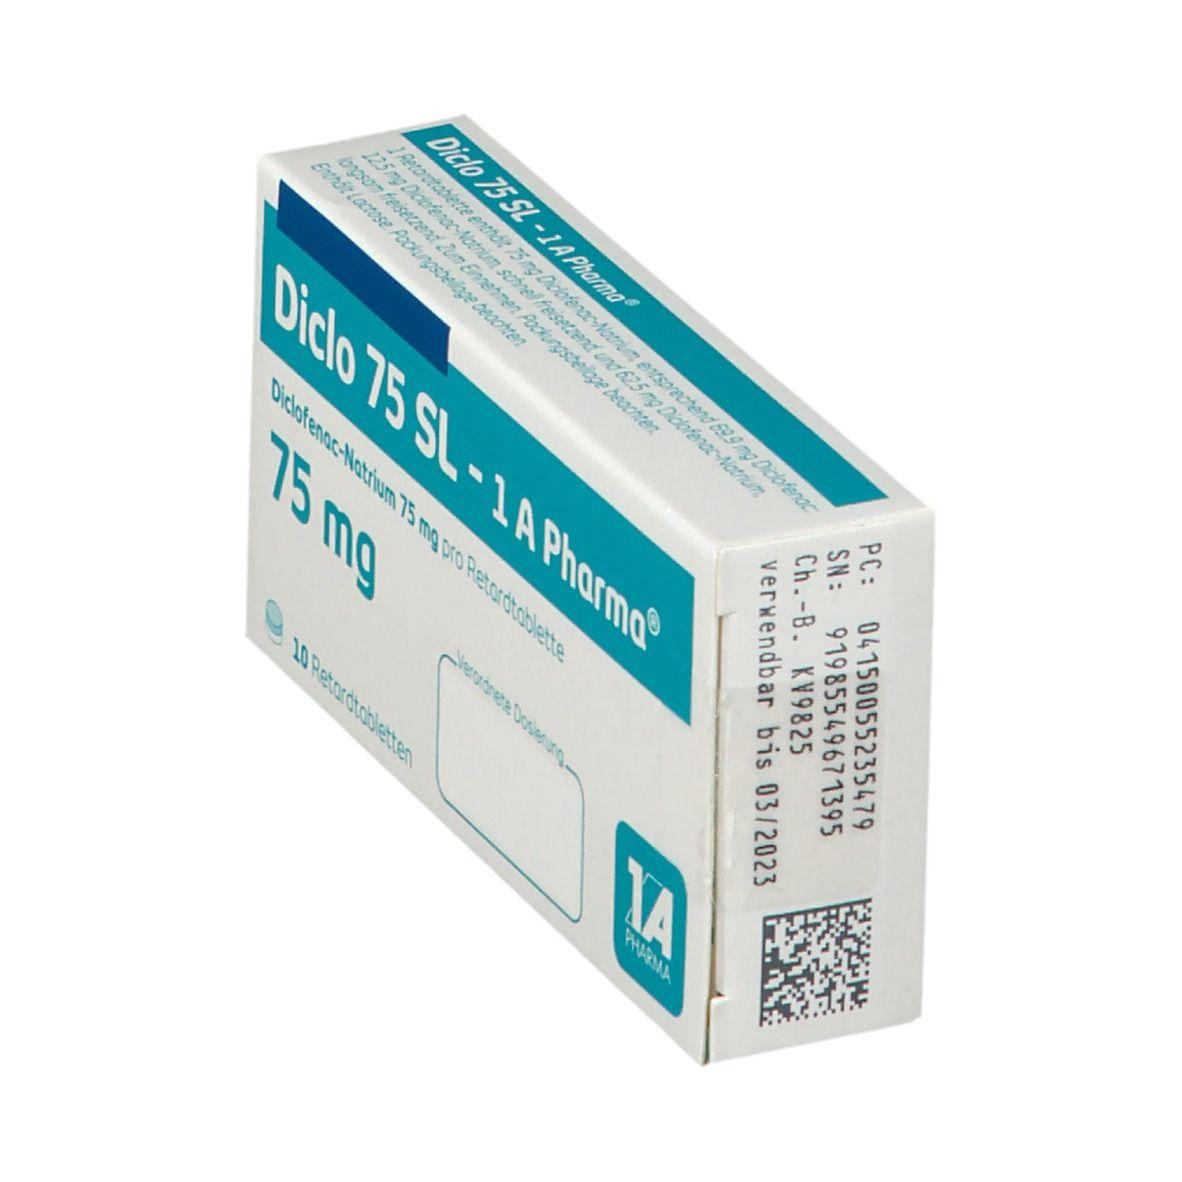 DICLO 75 SL 1A Pharma